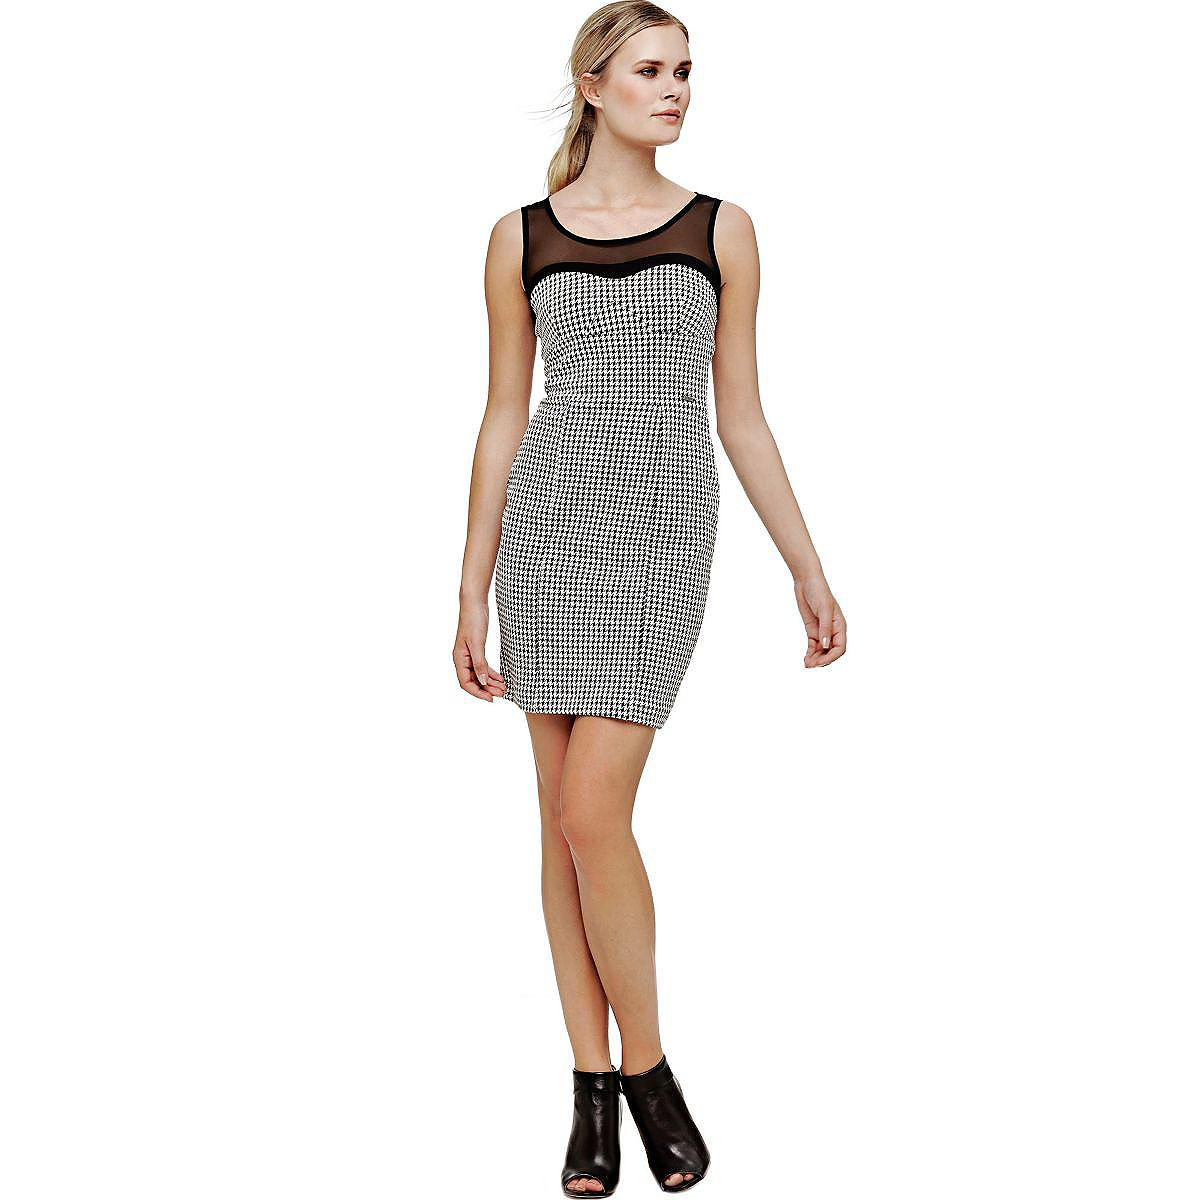 Guess jurk met halftransparante inzet zwart